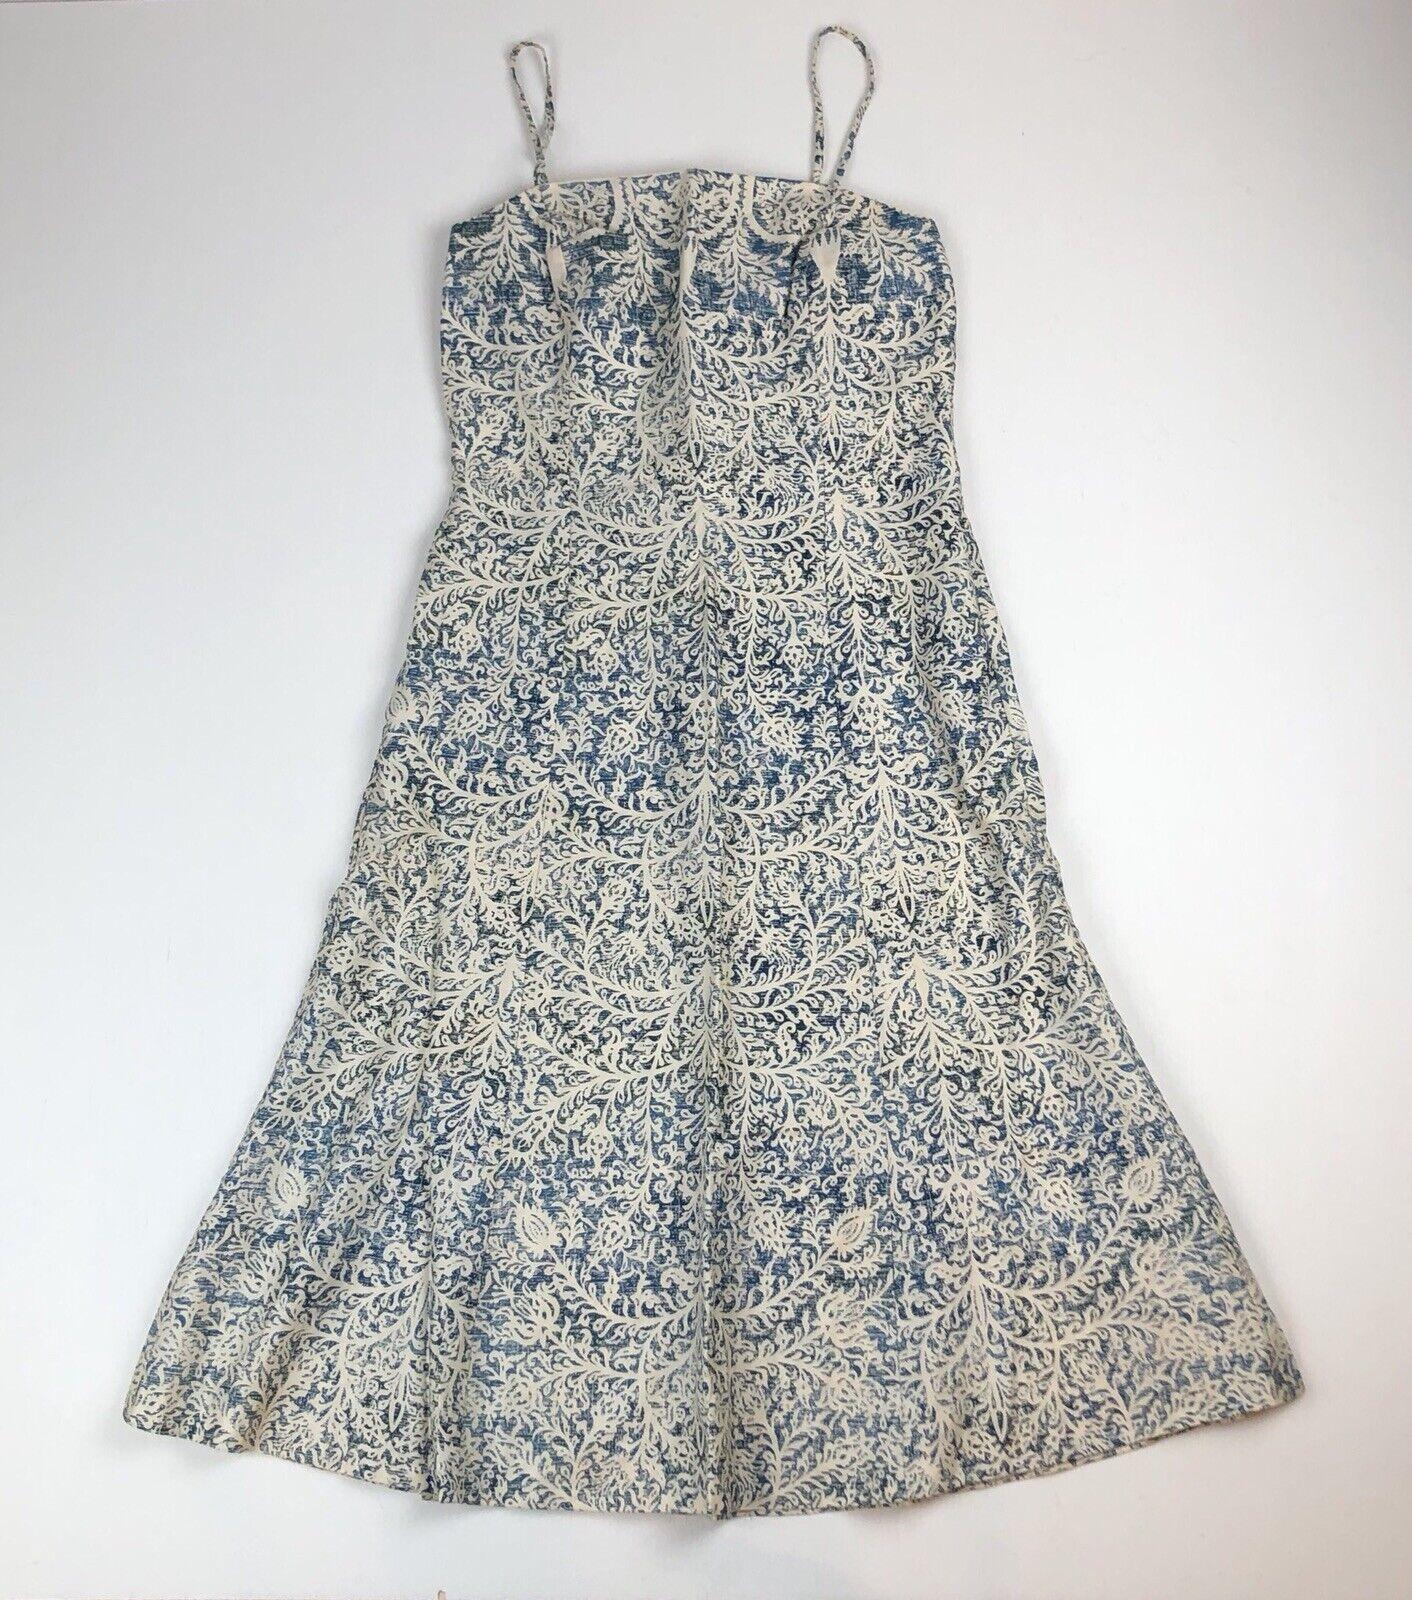 PERUVIAN CONNECTION bluees & Cream Floral Print Dress w Spaghetti Straps Sz 8